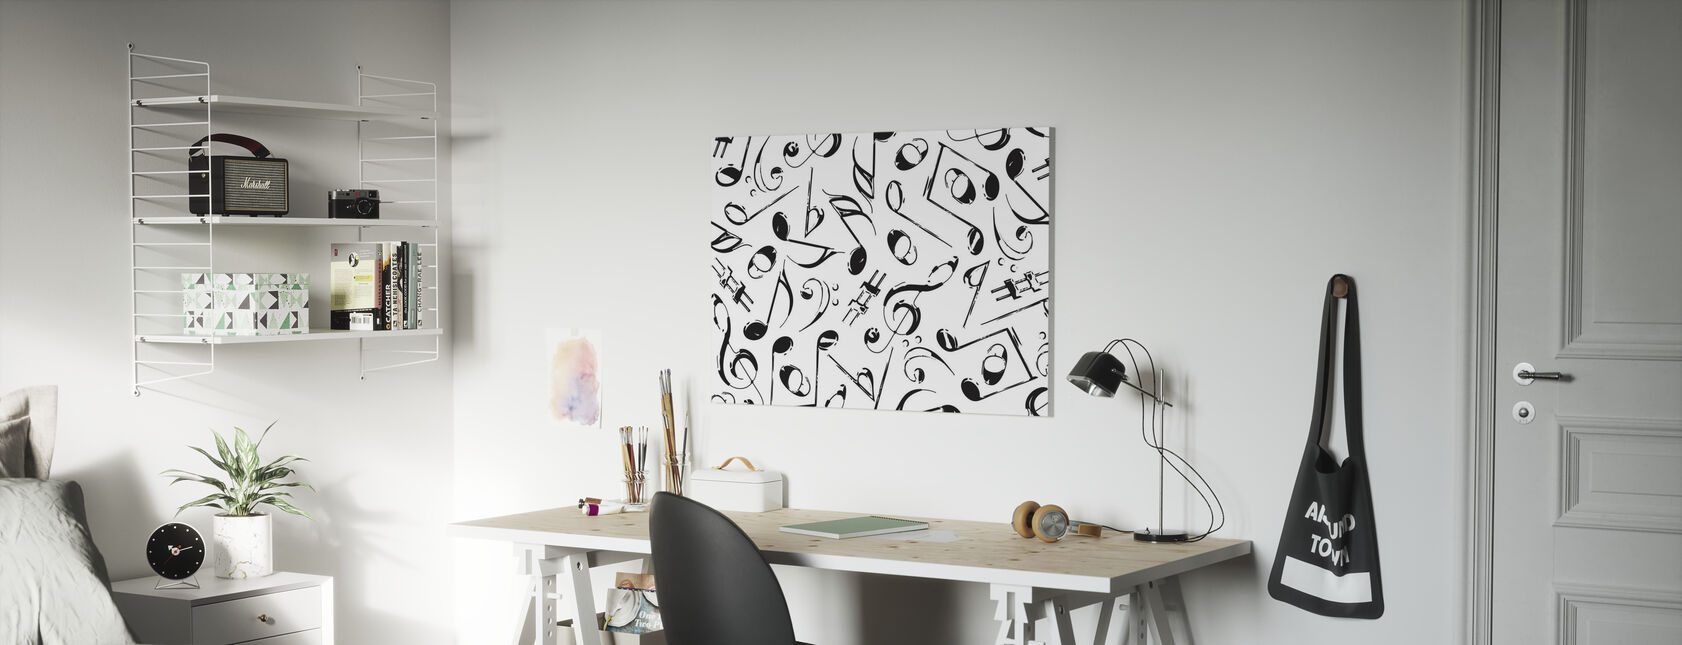 Grunge Muzieknoten - Canvas print - Kinderkamer